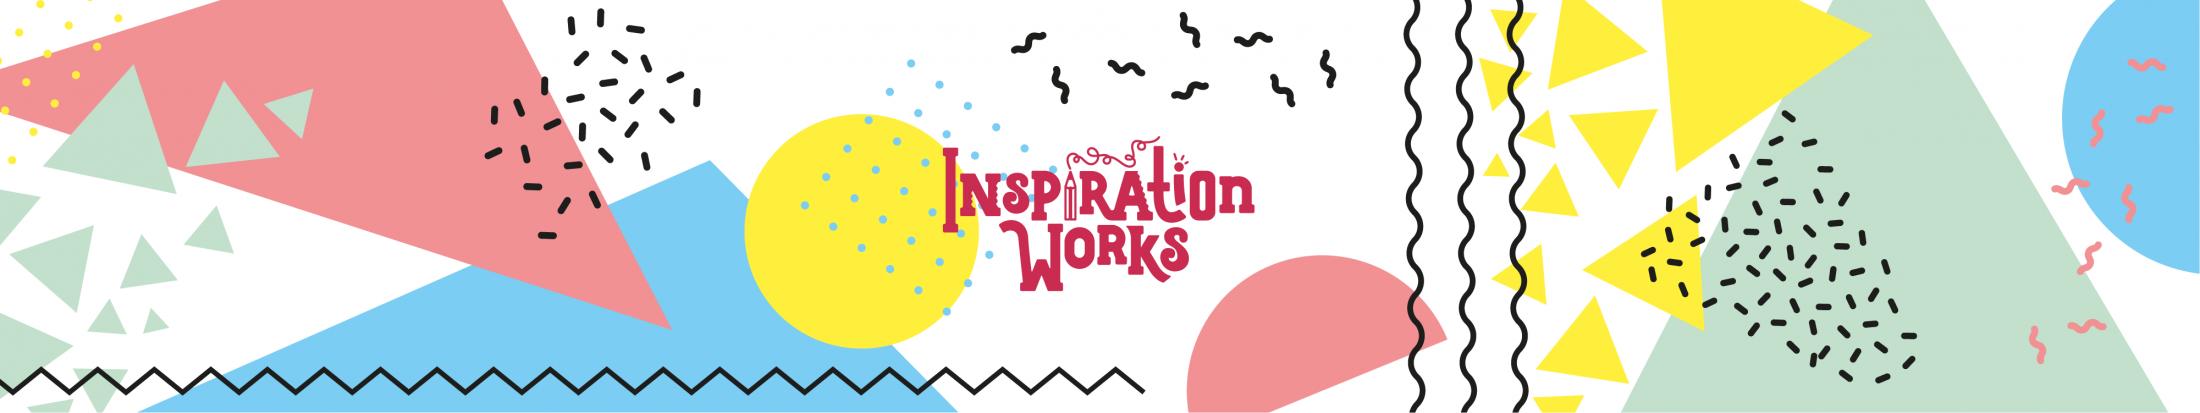 Inspiration Works